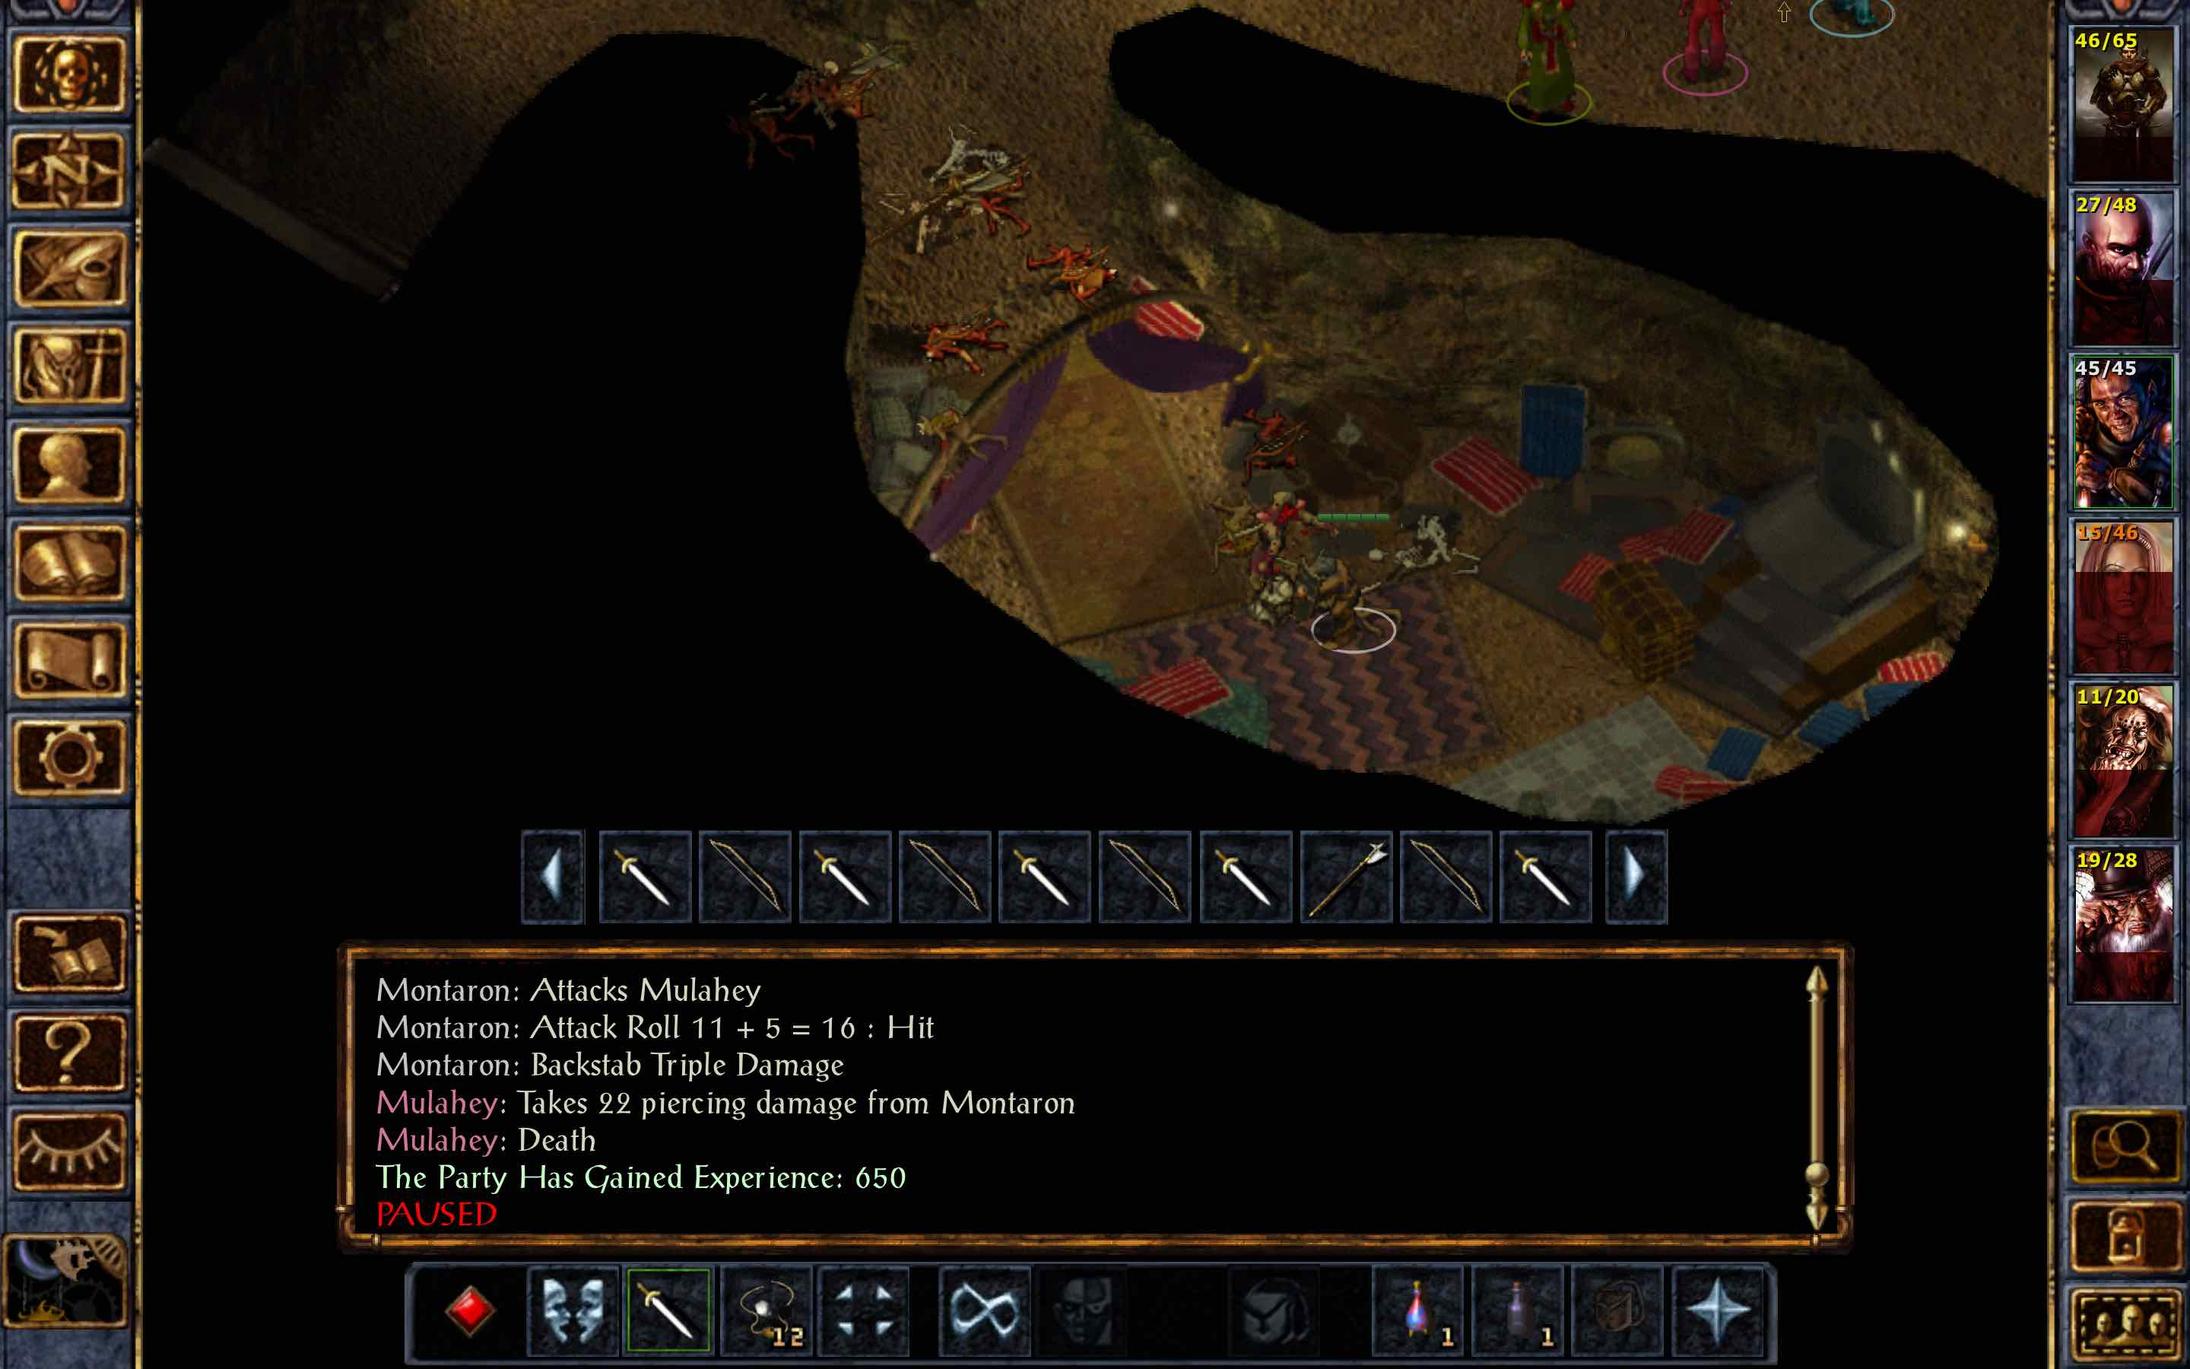 cg7amcpuk4tl.jpg